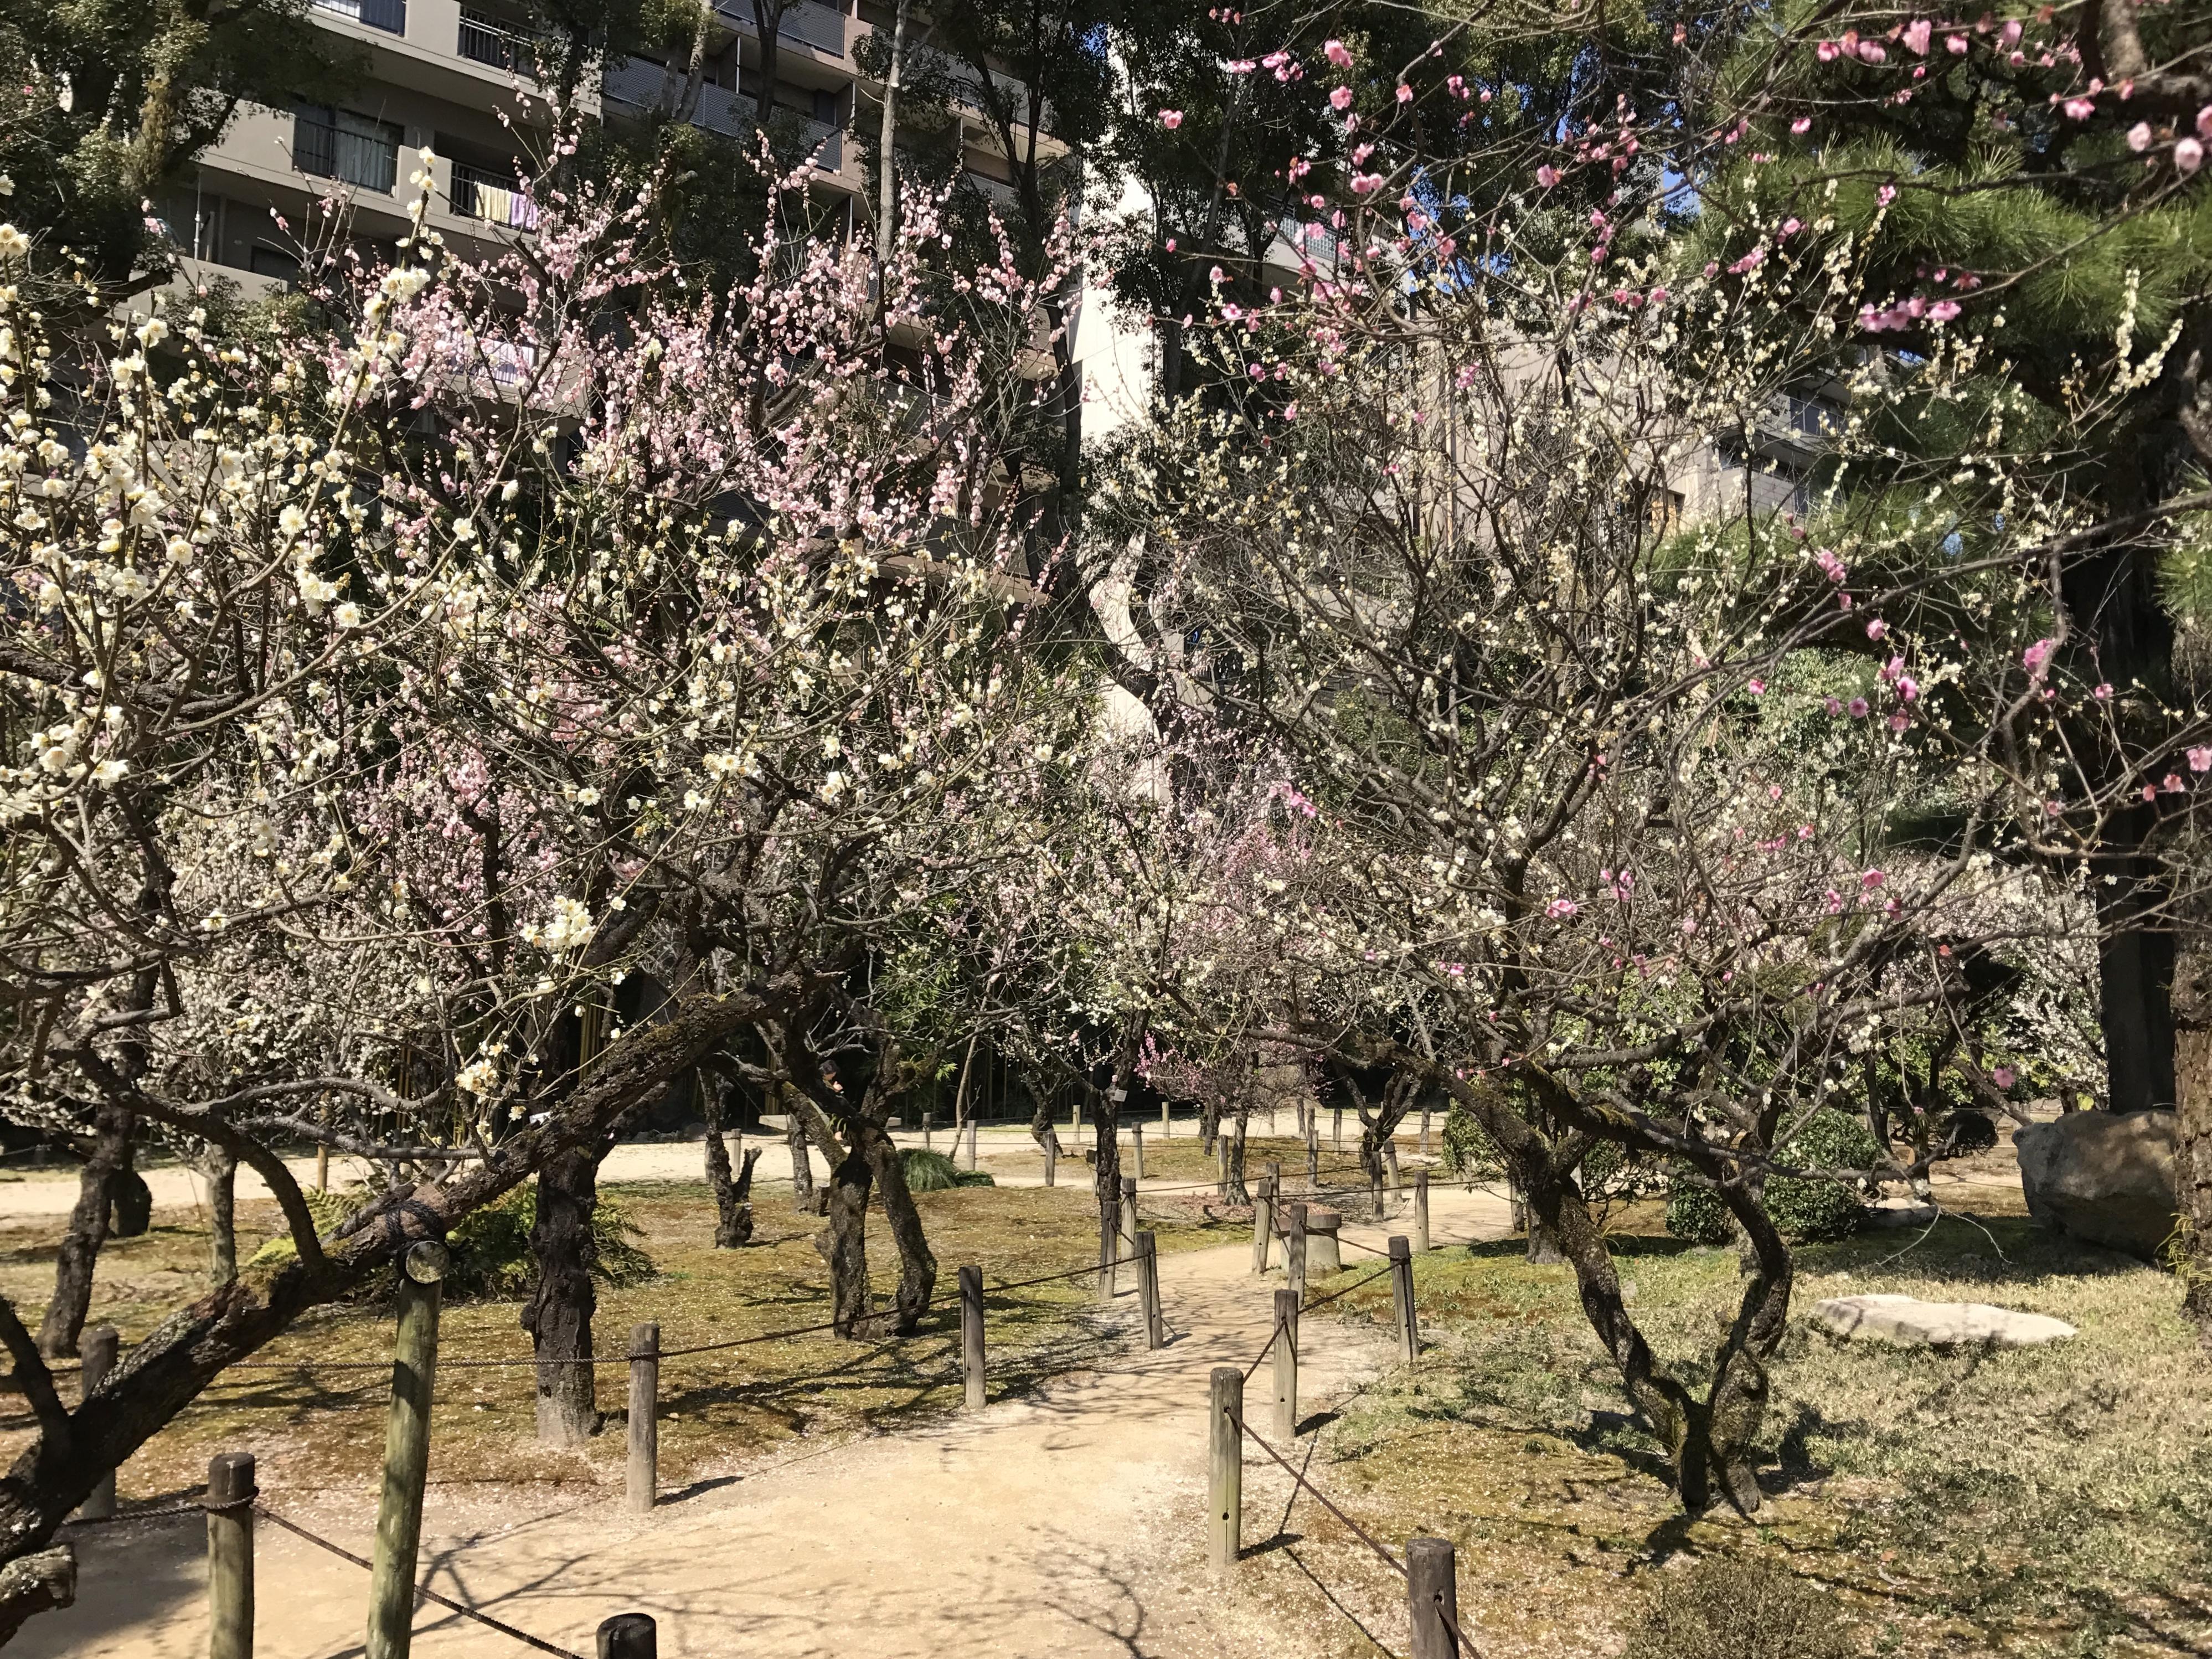 File:Plum blossoms in Shukkei Garden 4.jpg - Wikimedia Commons